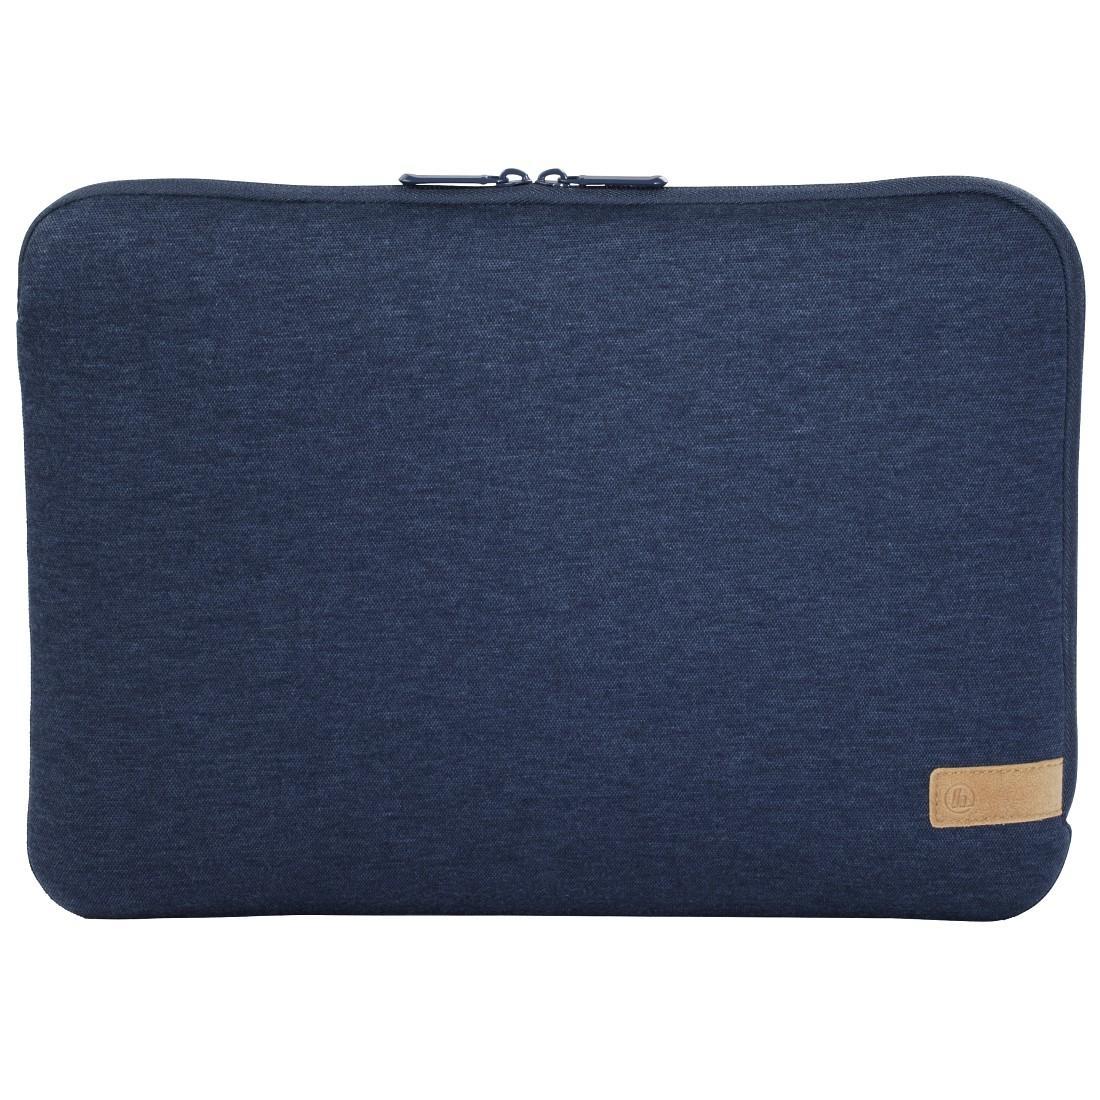 "Универсален калъф за лаптоп HAMA Jersey, до 40 см  (15.6""), Син-2"